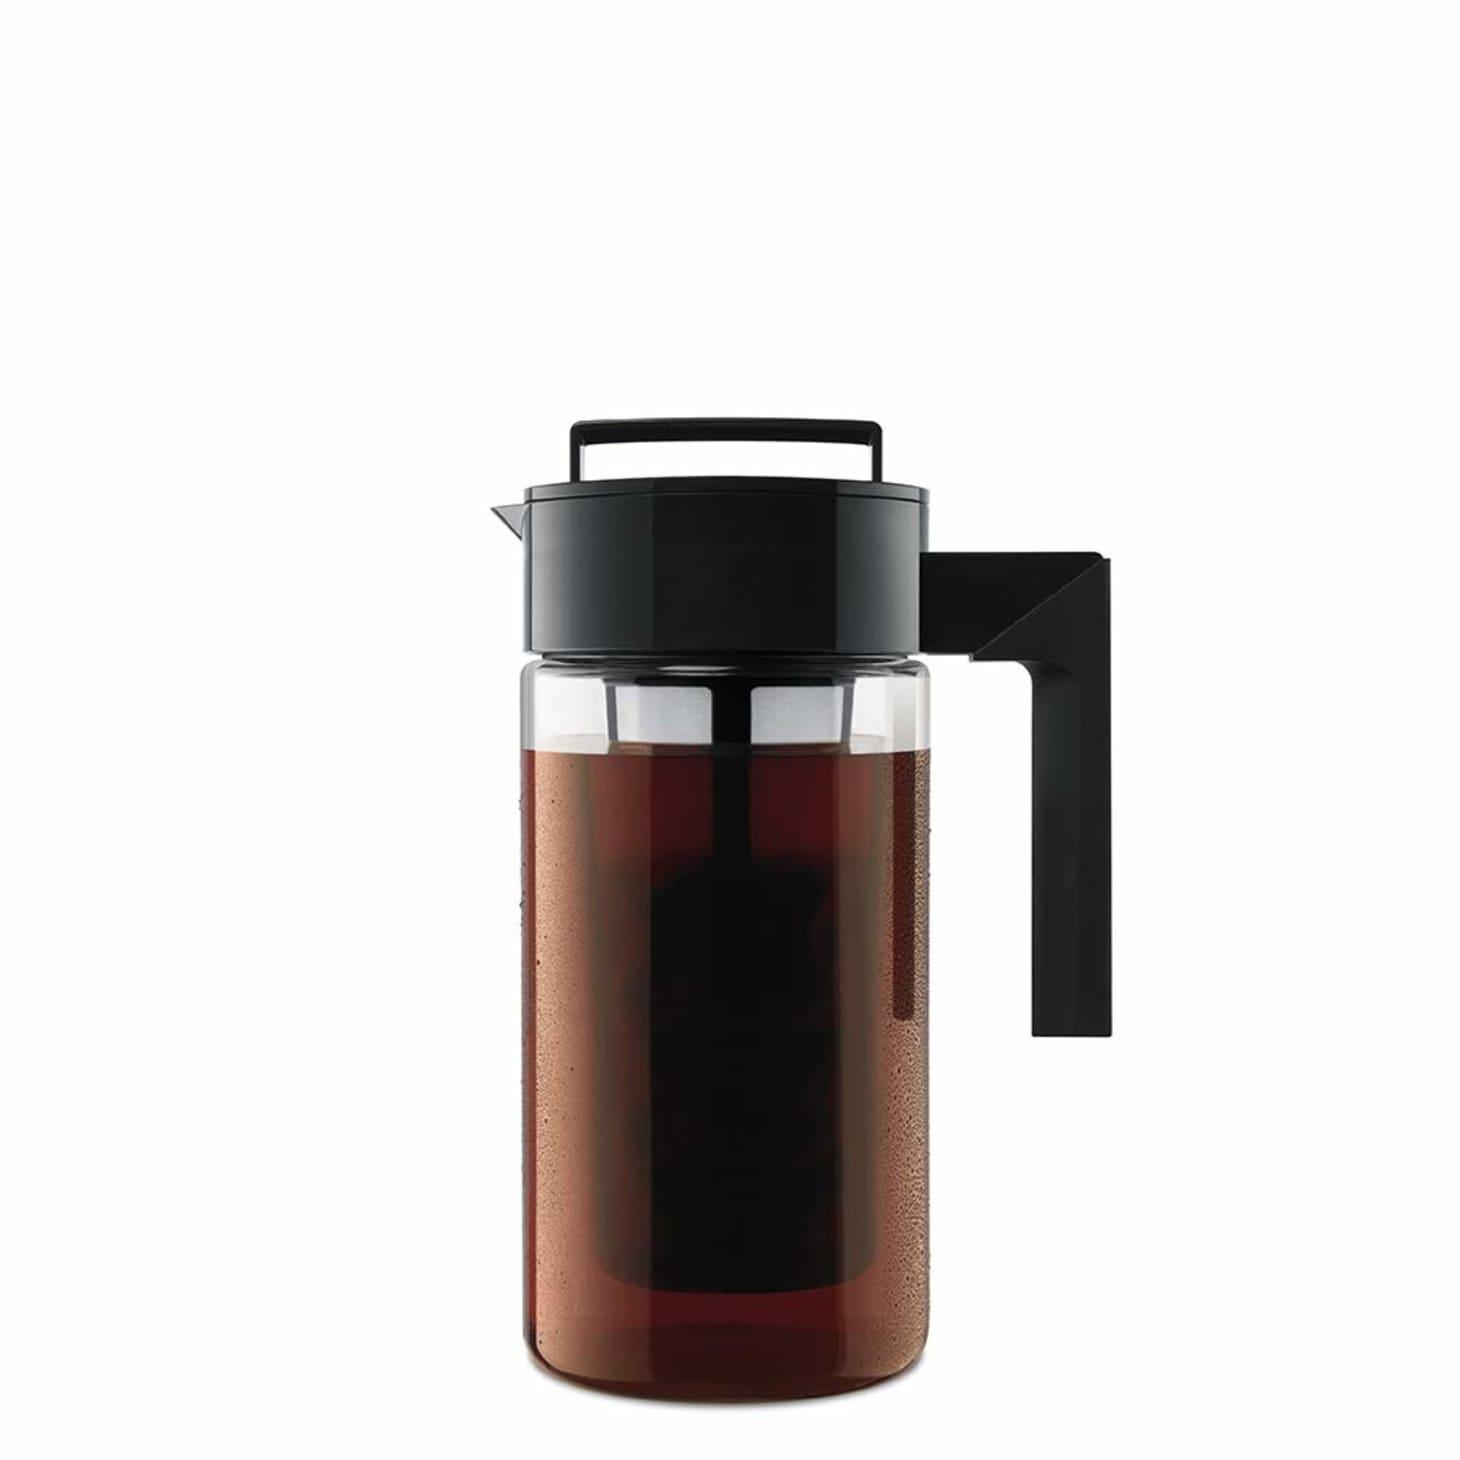 Best Cold Brew Coffee Maker | Kitchn